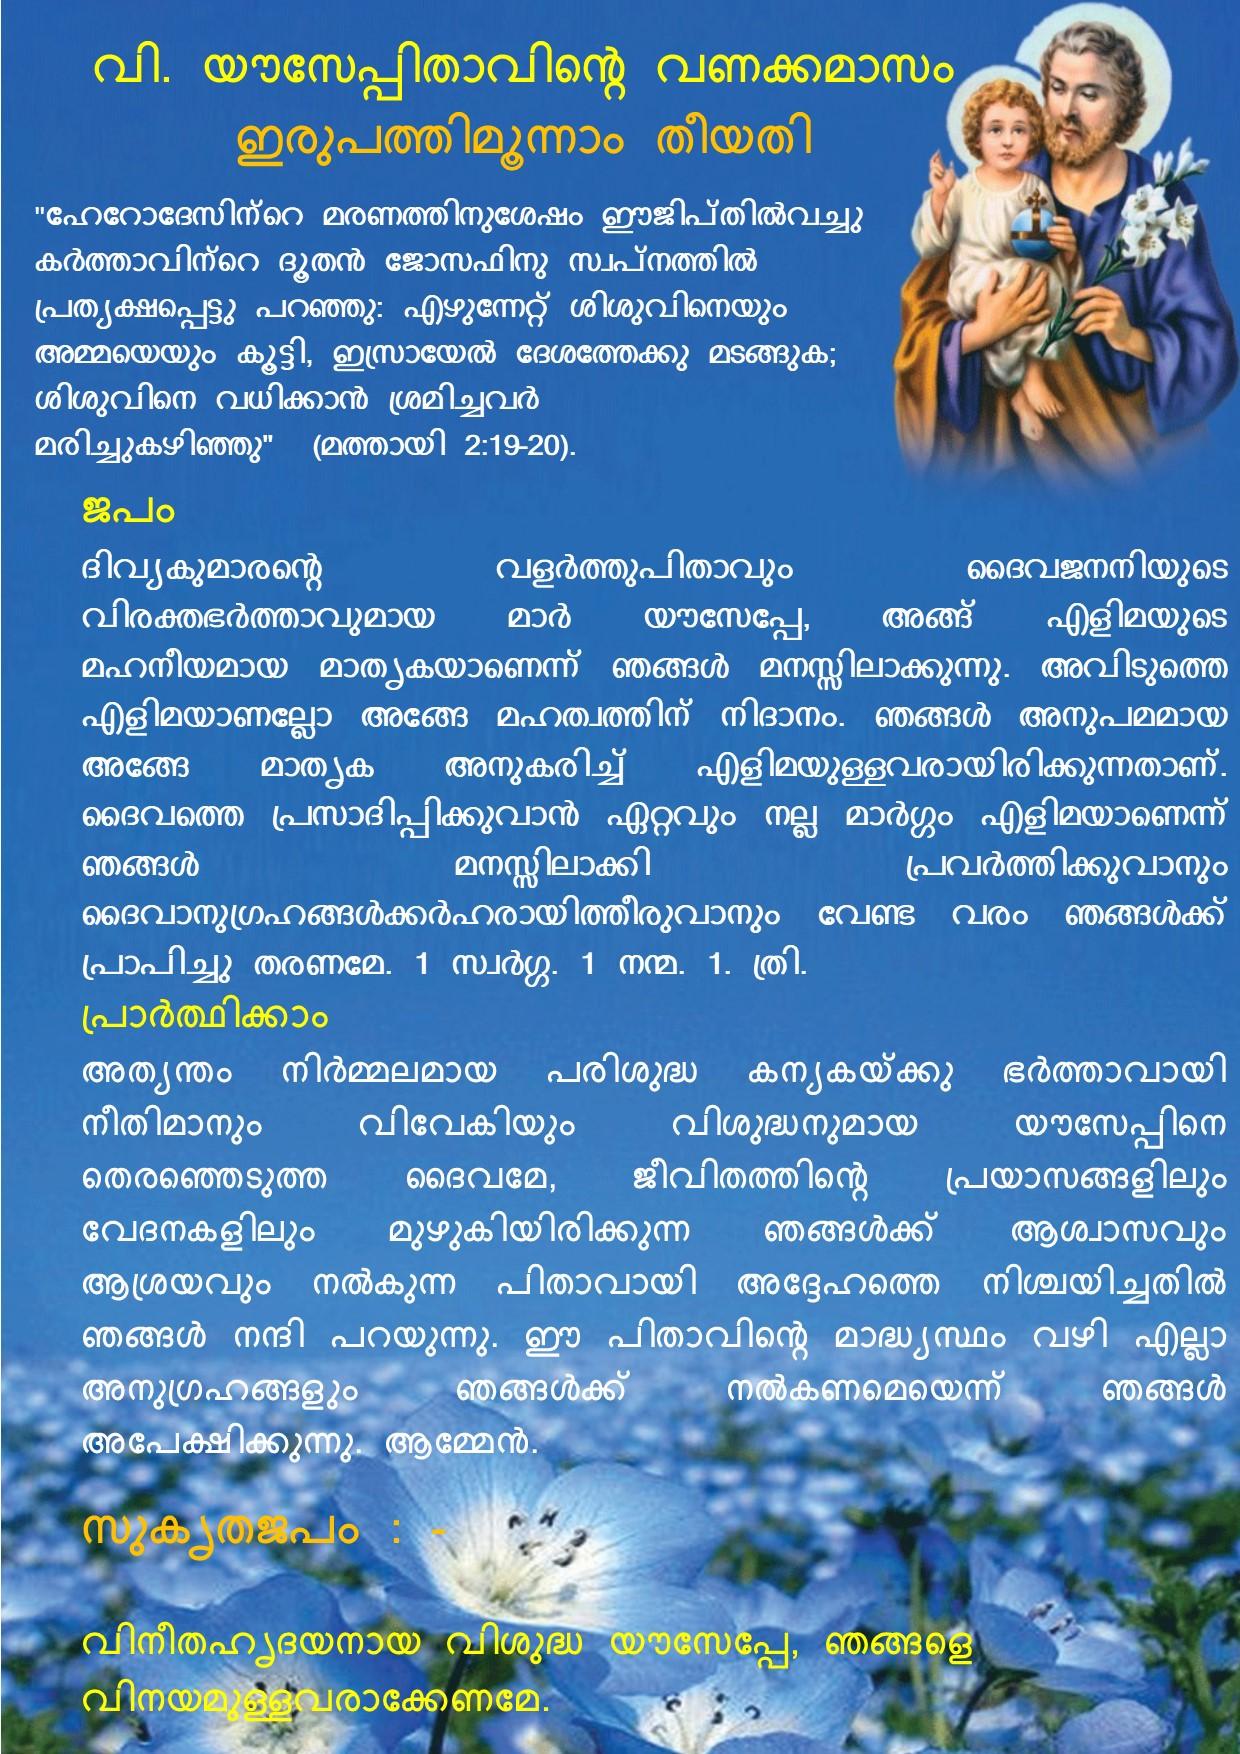 Vanakkamasam, St Joseph, March 23